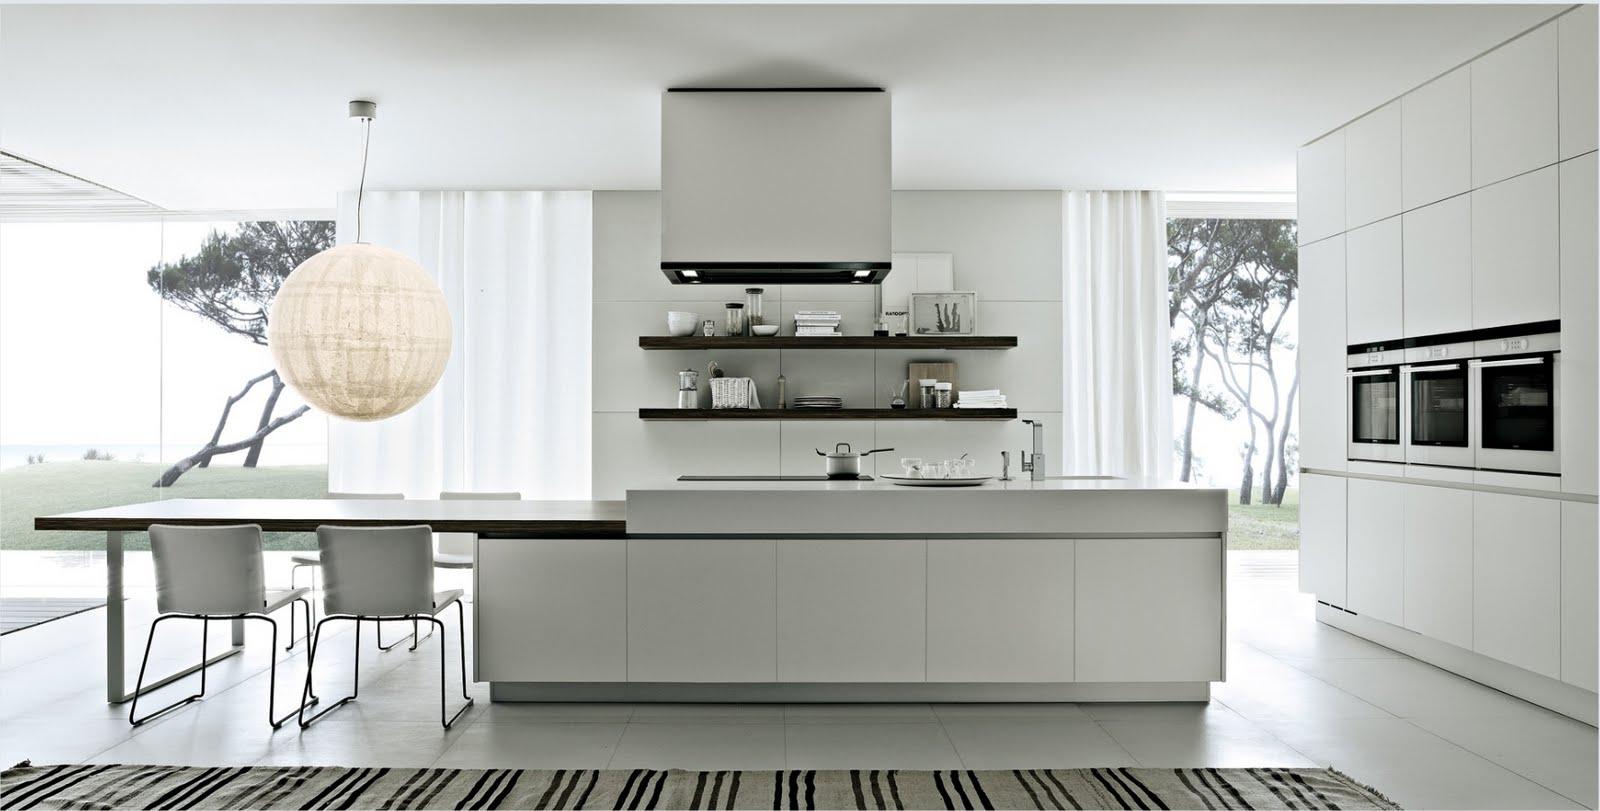 Varenna Cucine Opinioni : Maison grace varenna matrix kitchens